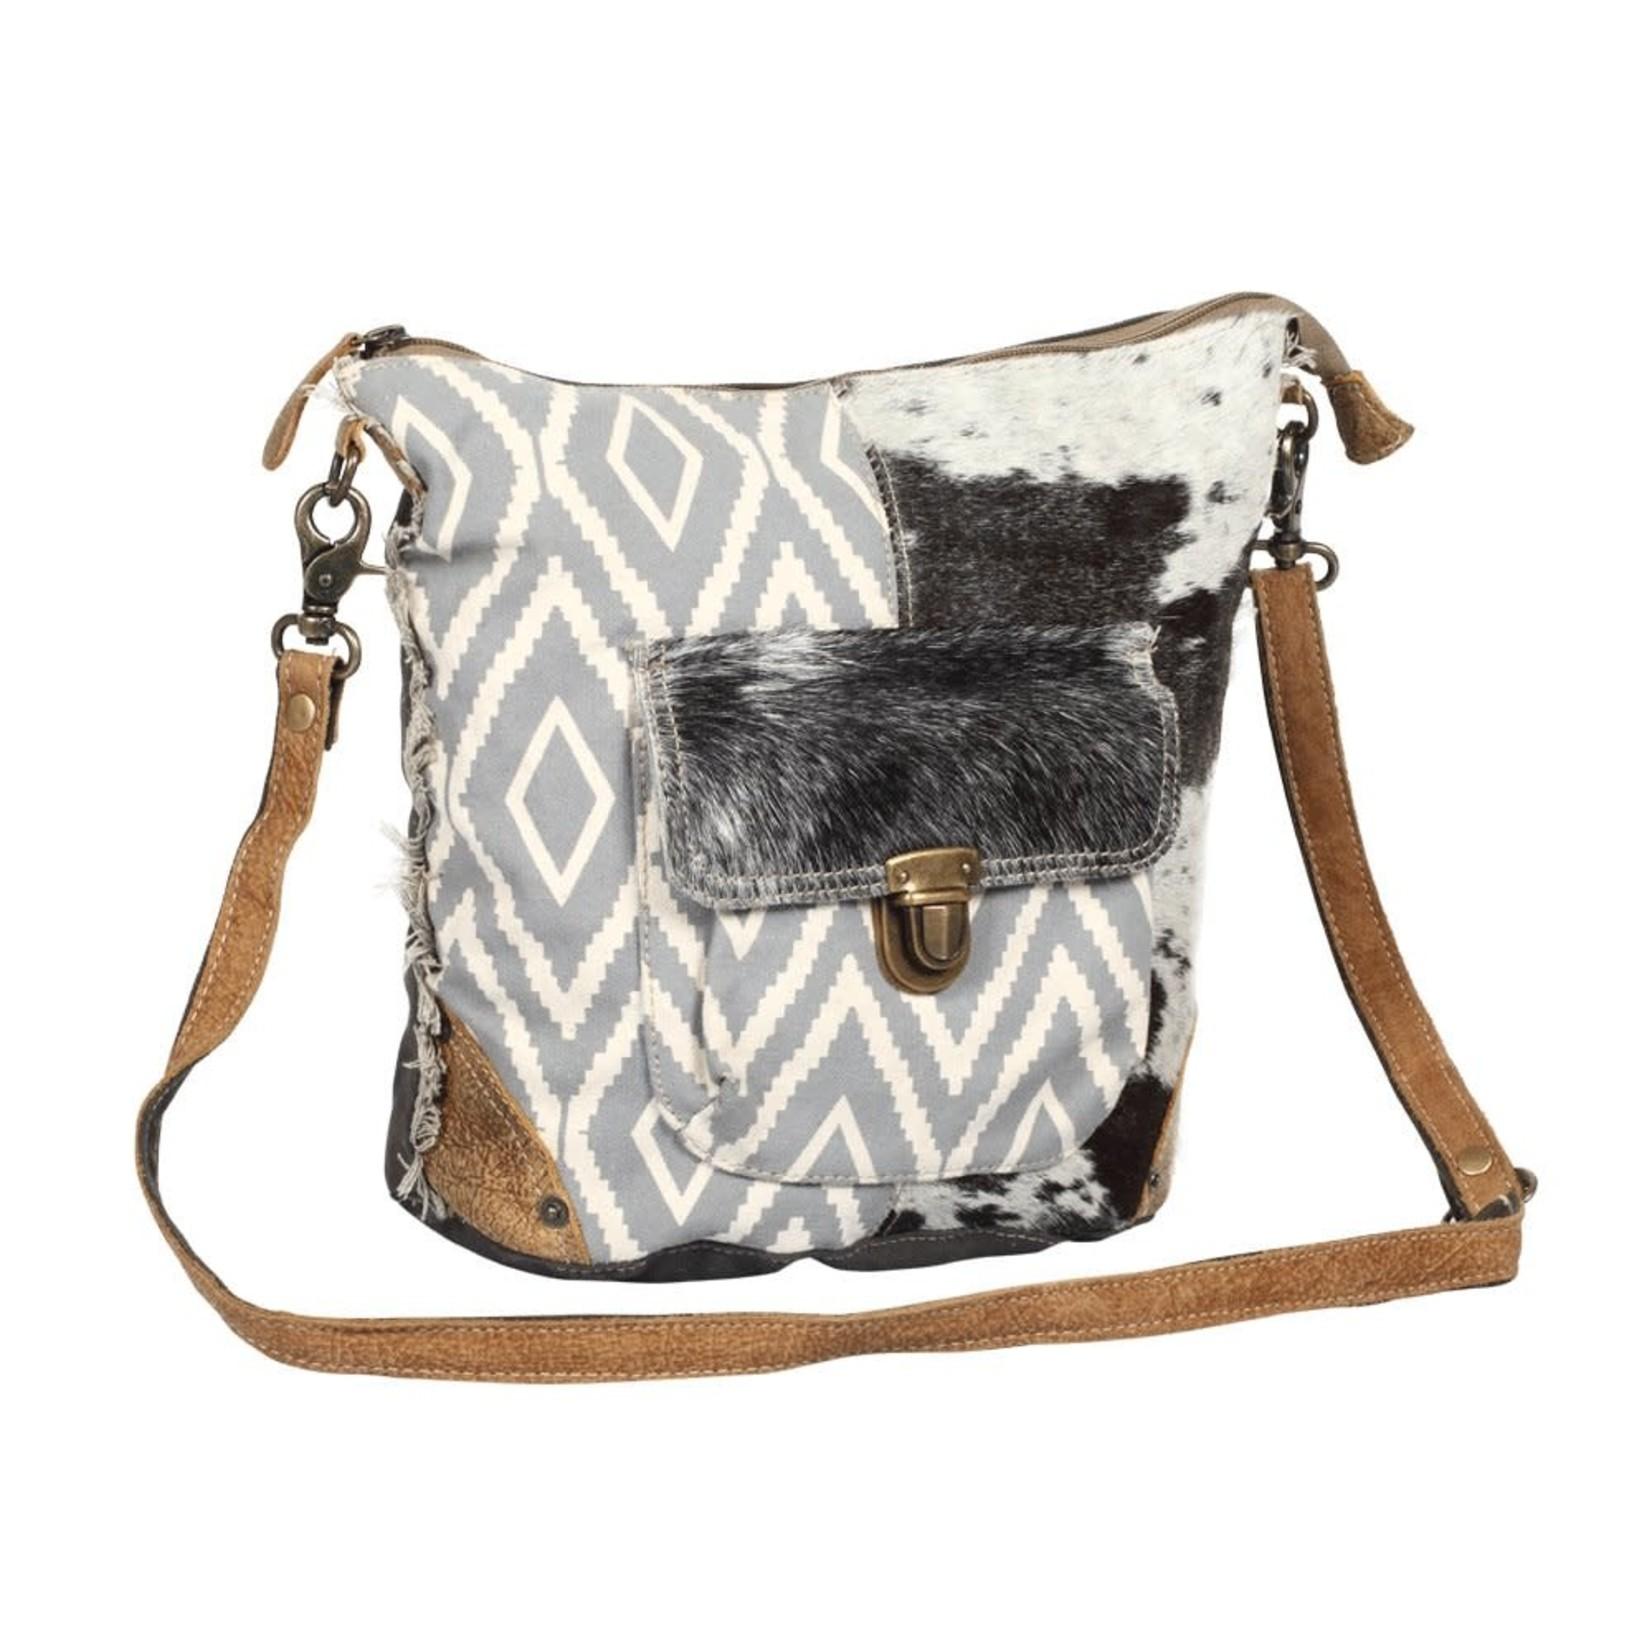 Myra Bags S-1368 Mystical Shoulder Bag